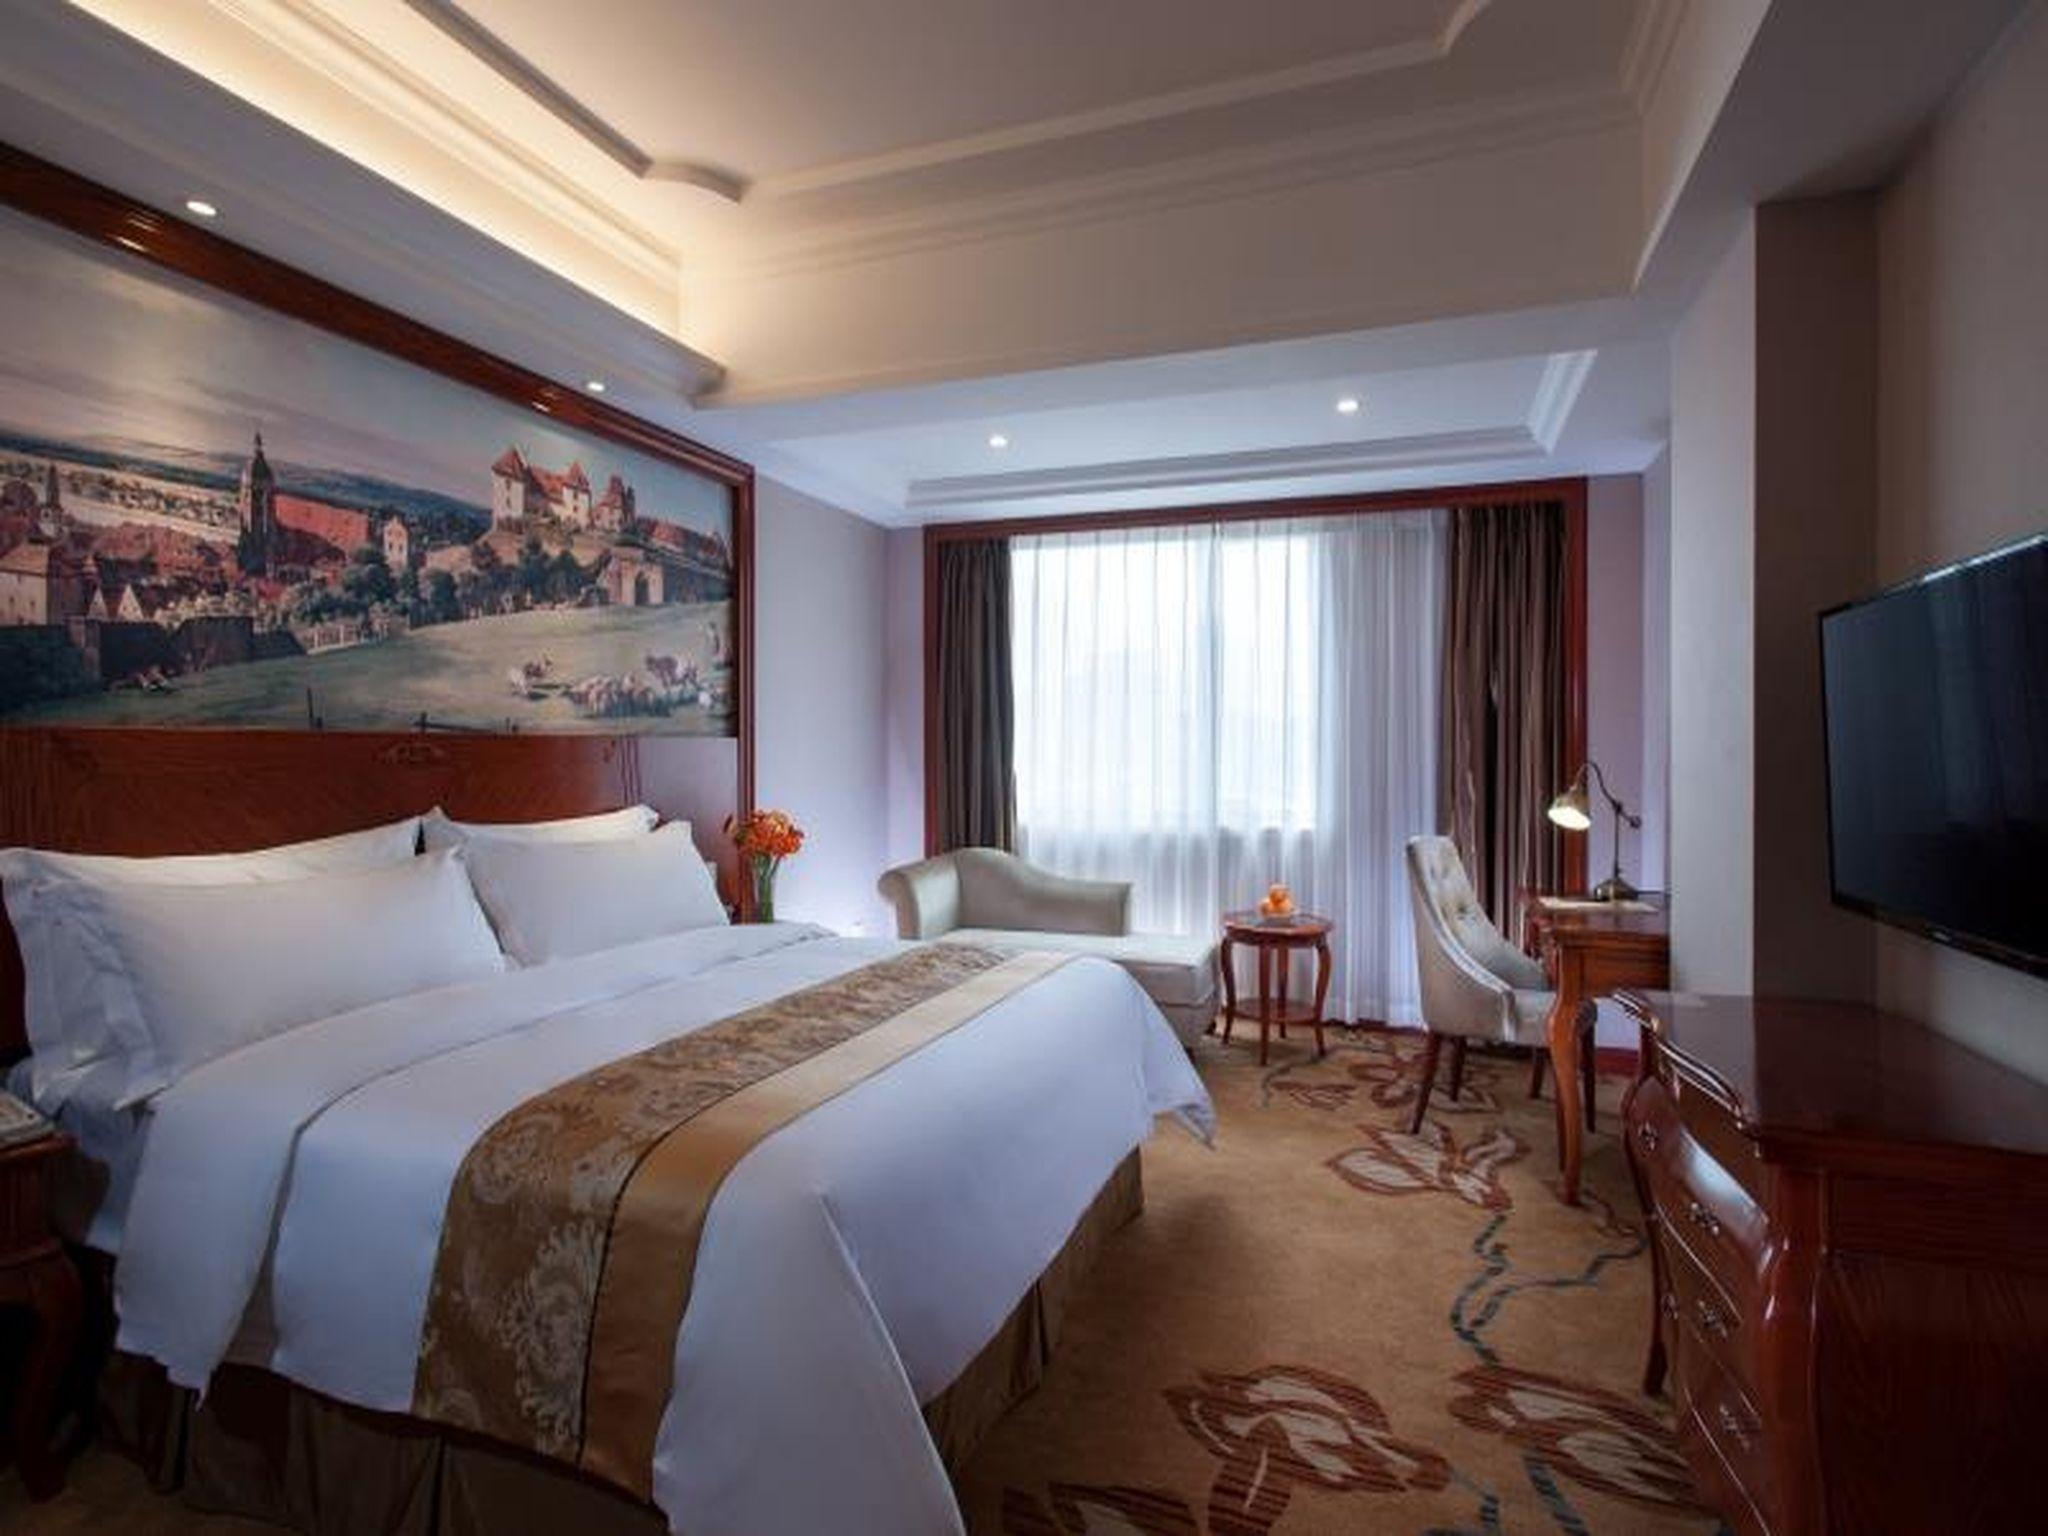 Vienna International Hotel Shaoguan Fengcai Tower Branch, Shaoguan